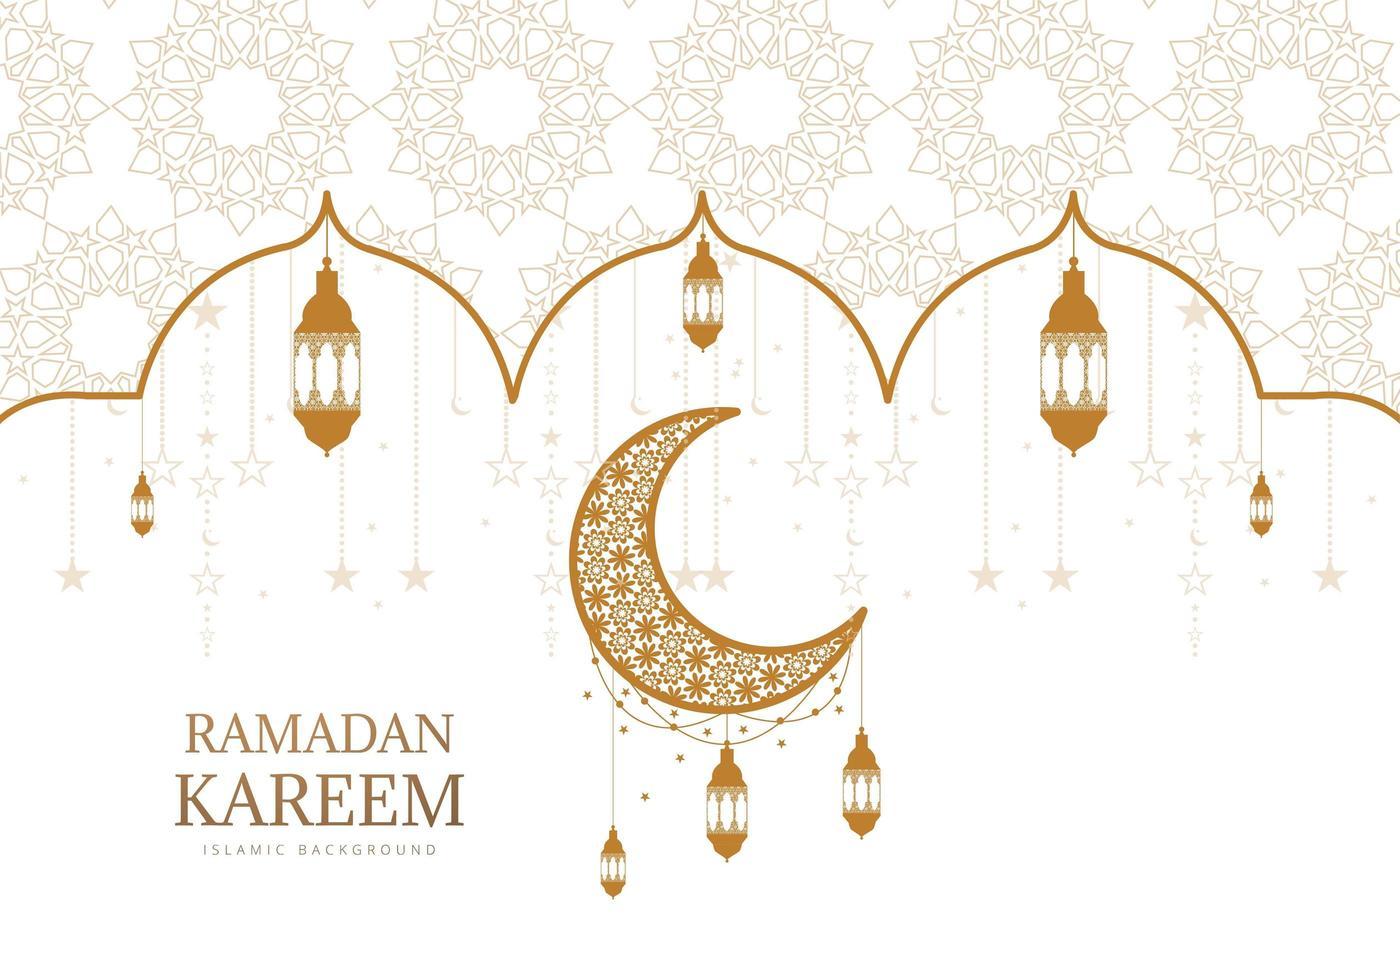 oro ornato e bianco ramadan kareem saluto vettore